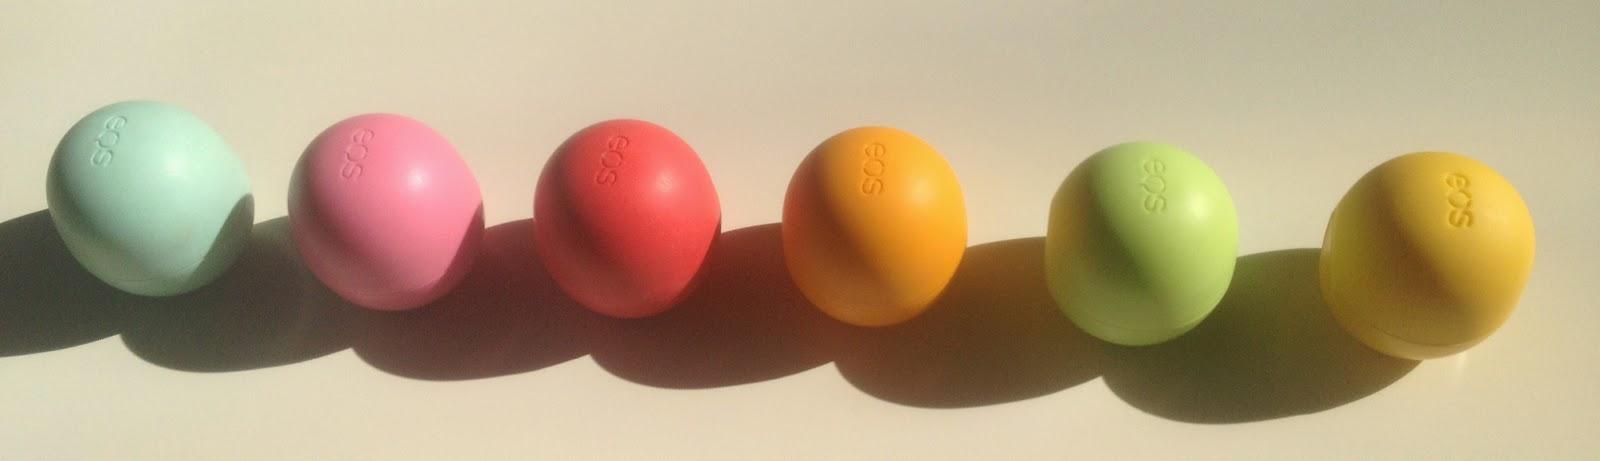 Lolin svet: Eos- Evolution Of Smoth lip balm